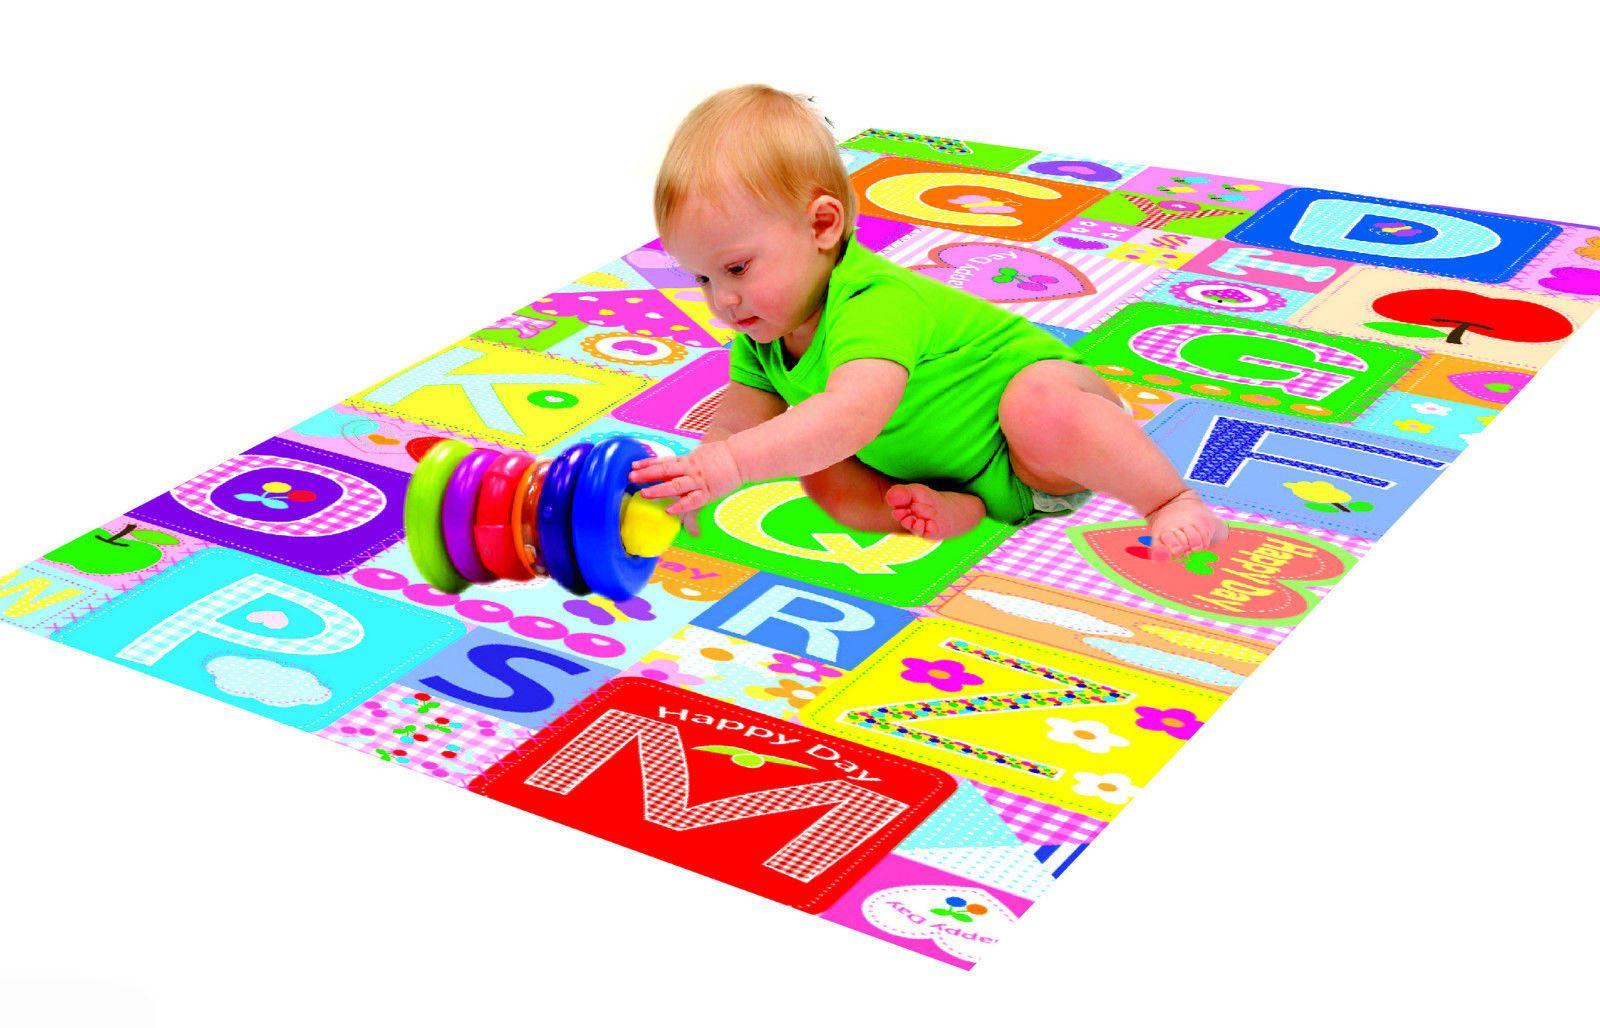 Play Mats For Toddlers 1 Play Mats For Toddlers